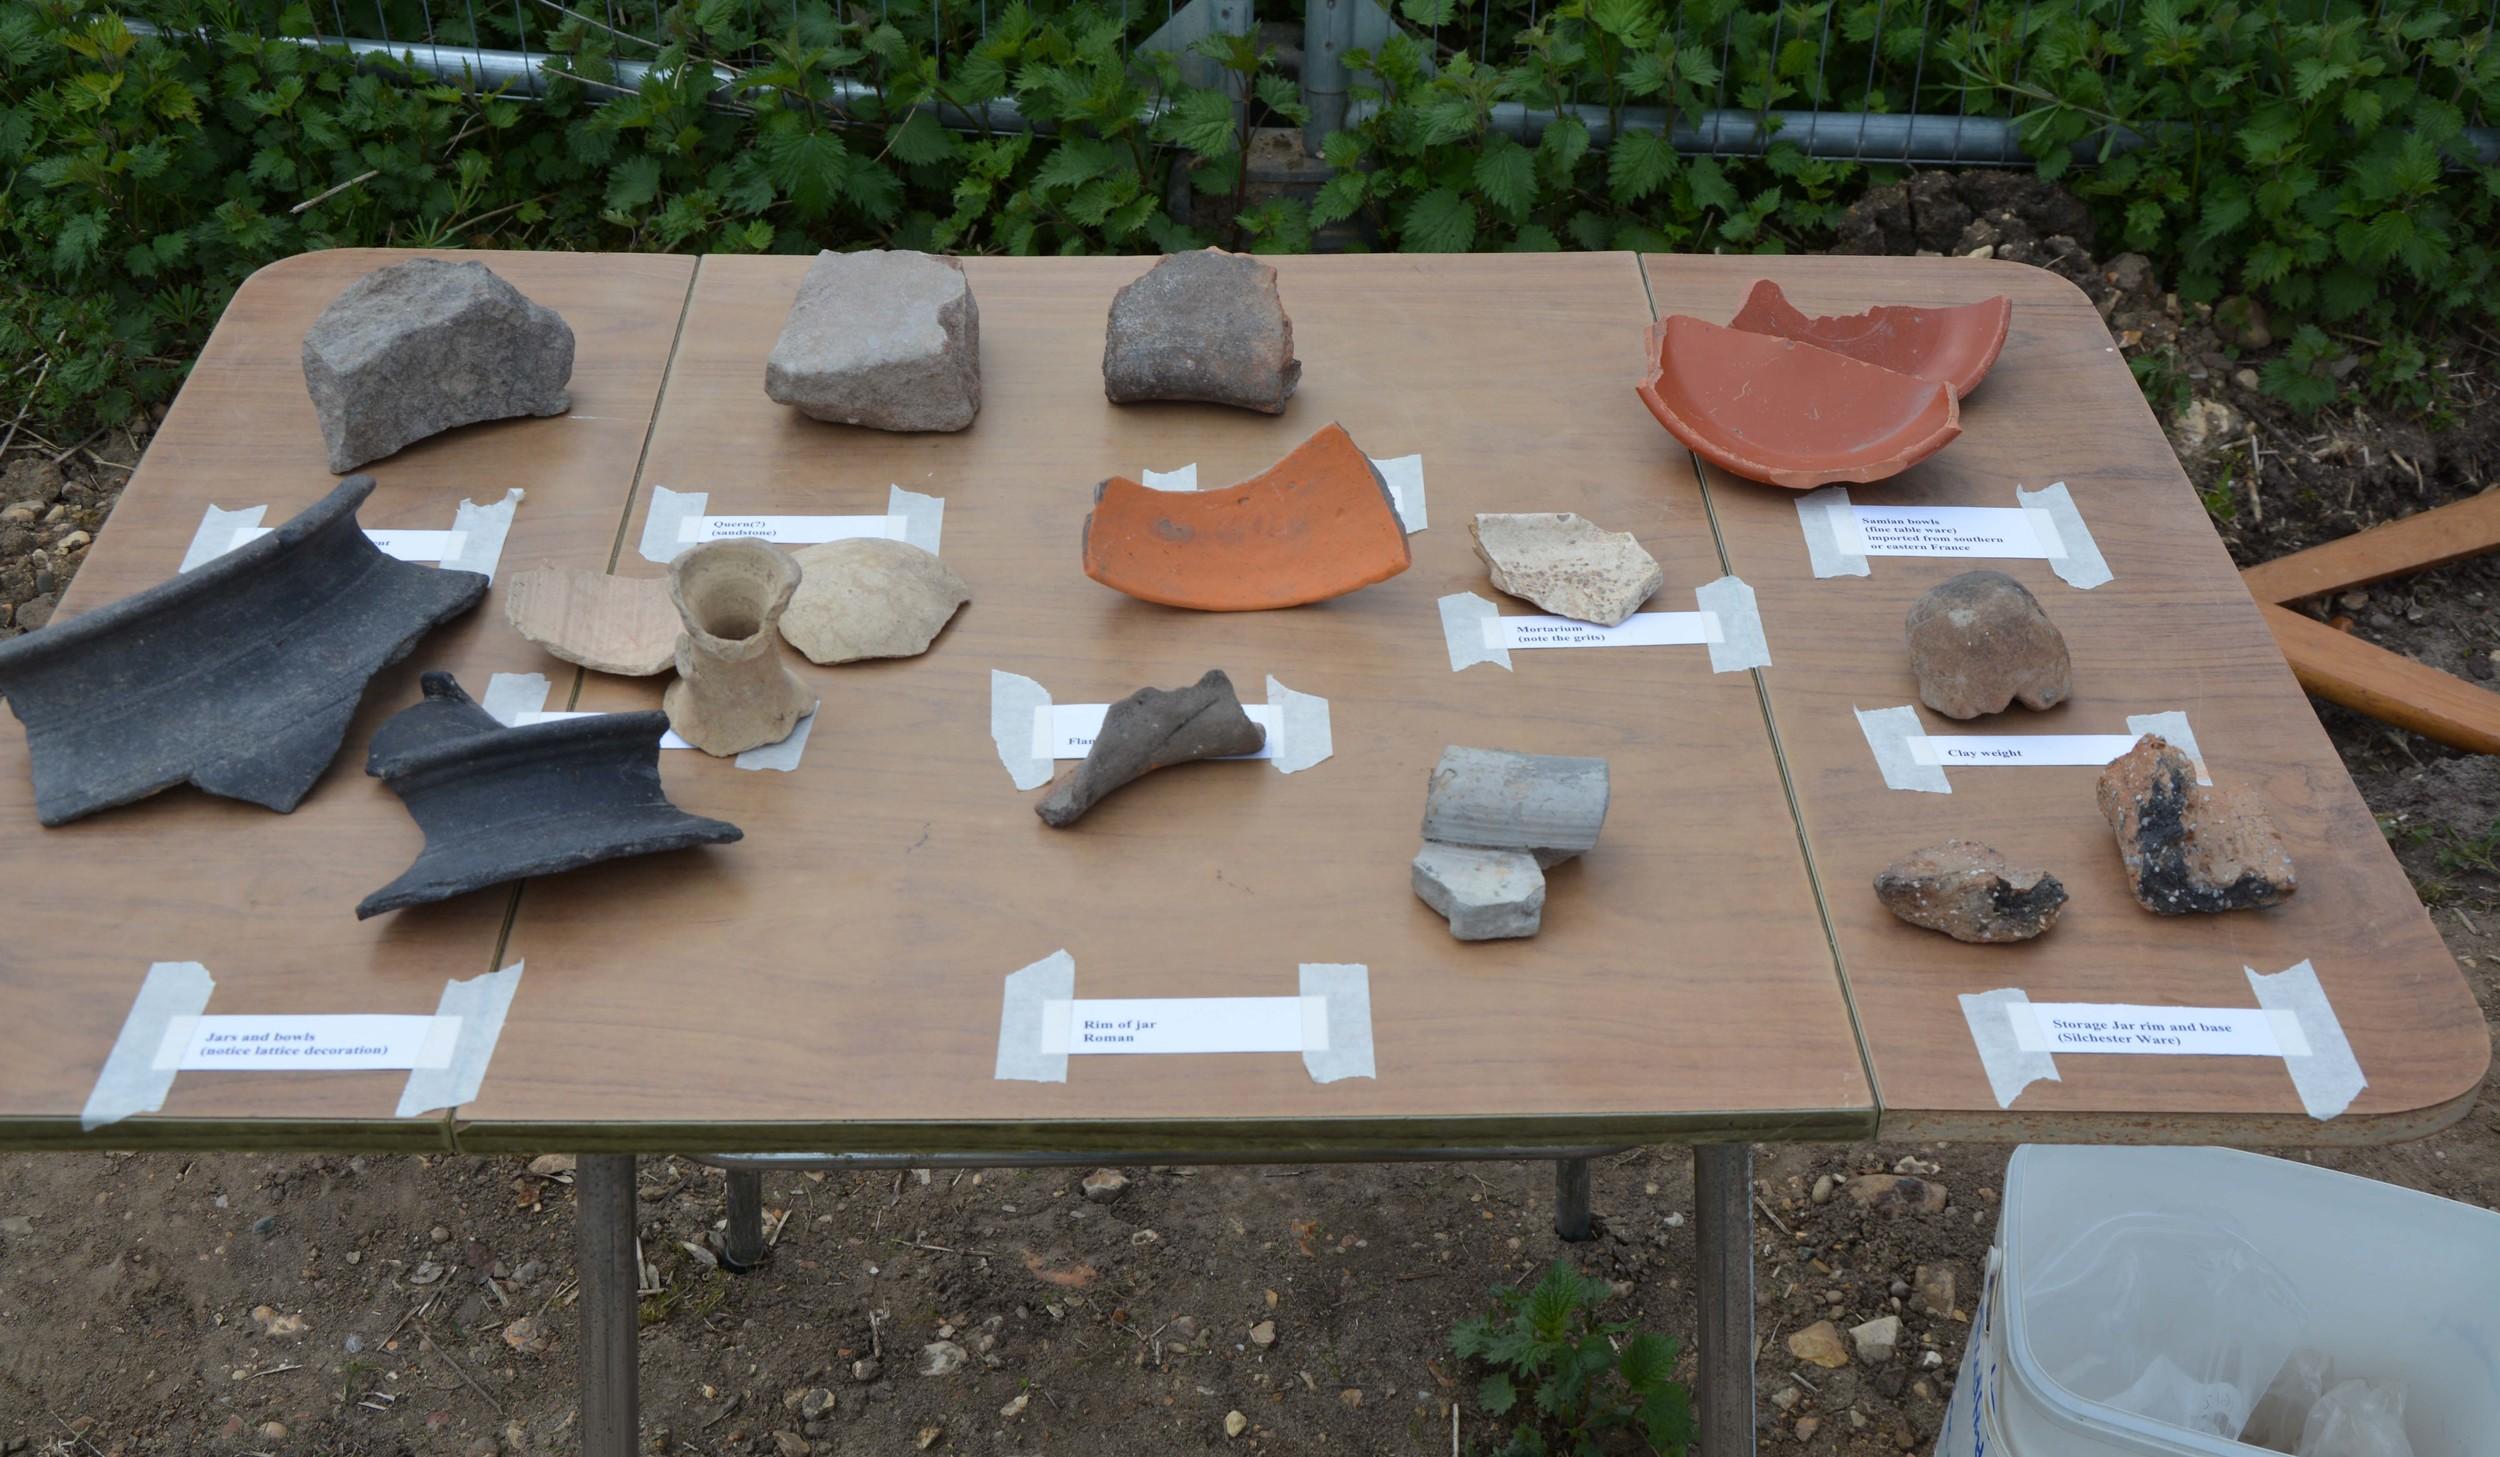 Some Iron Age & Roman pottery